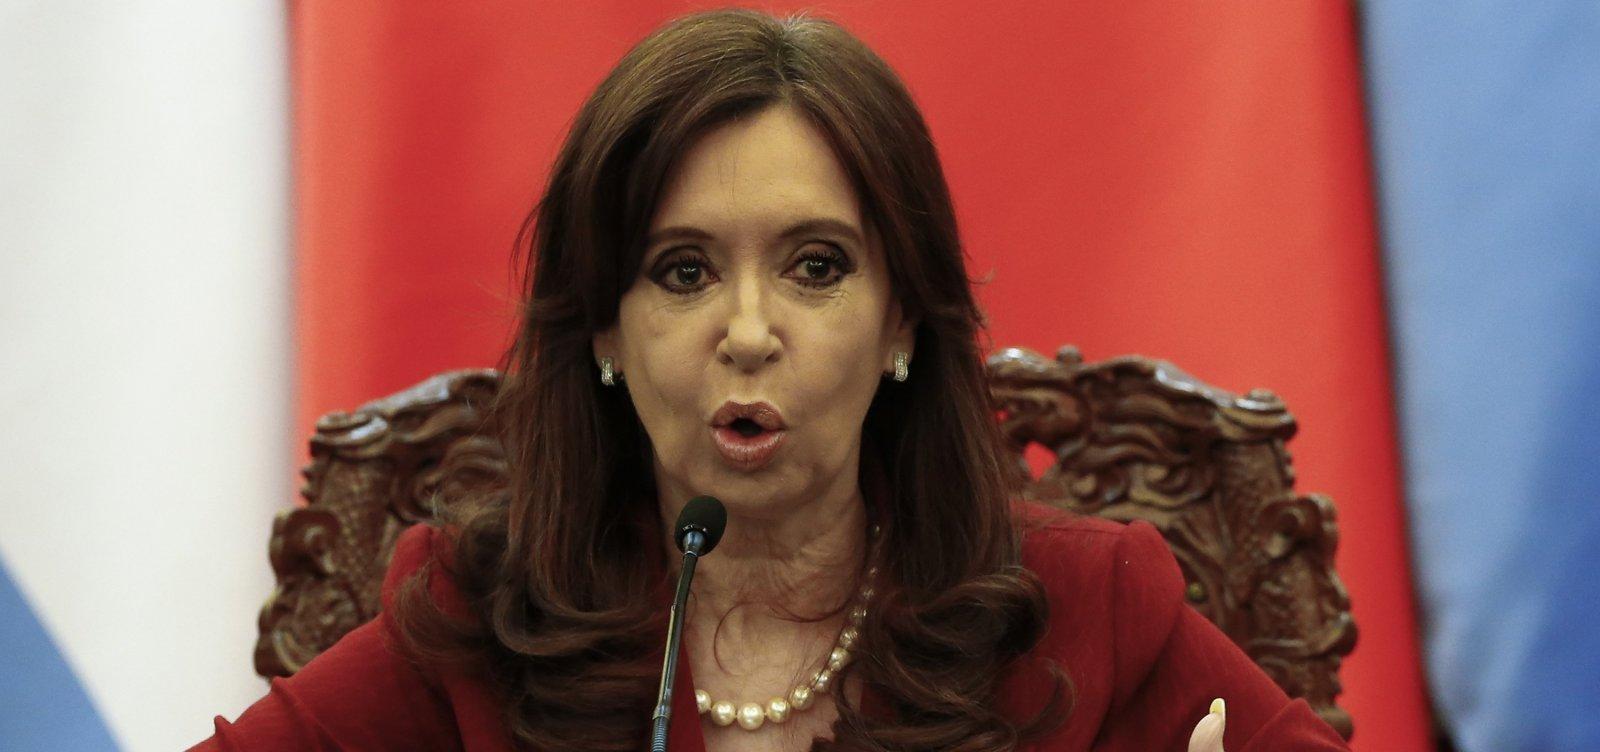 Juiz pede prisão preventiva da ex-presidente Cristina Kirchner